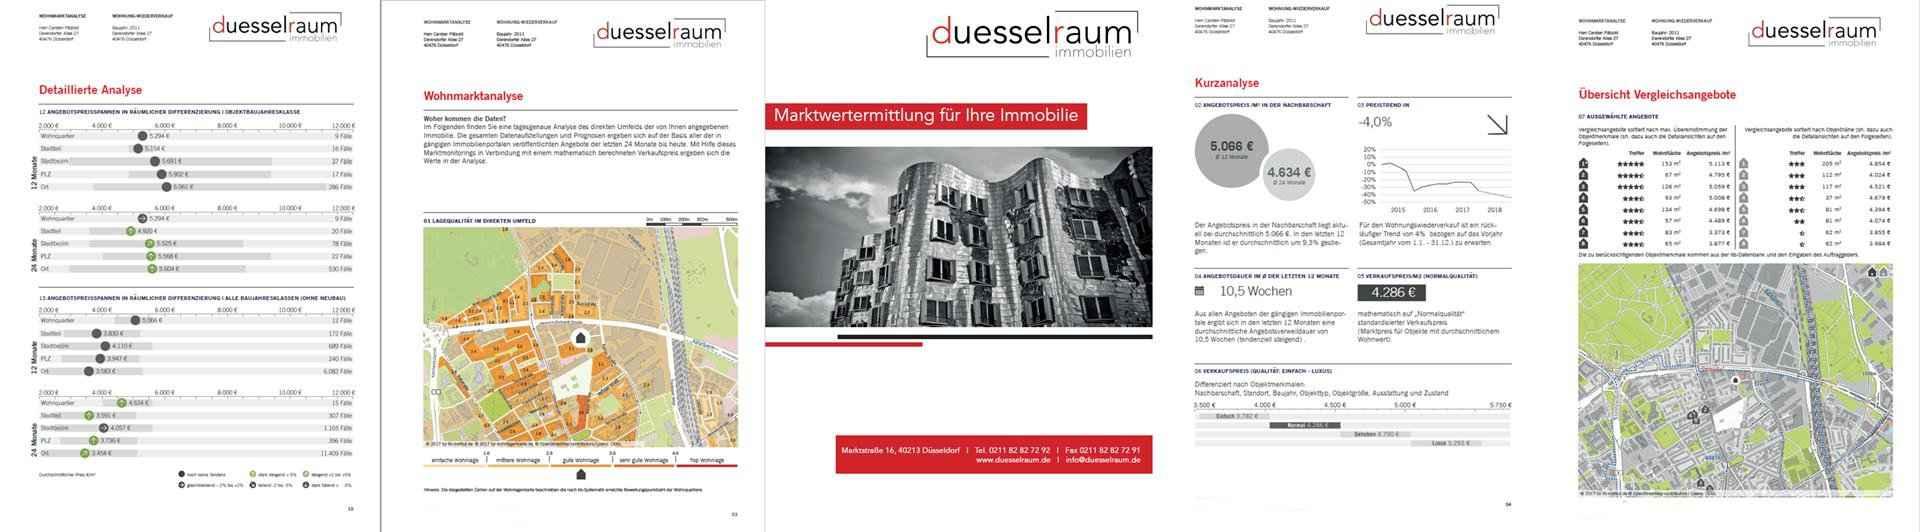 Marktwertanalyse duesselraum immobilien